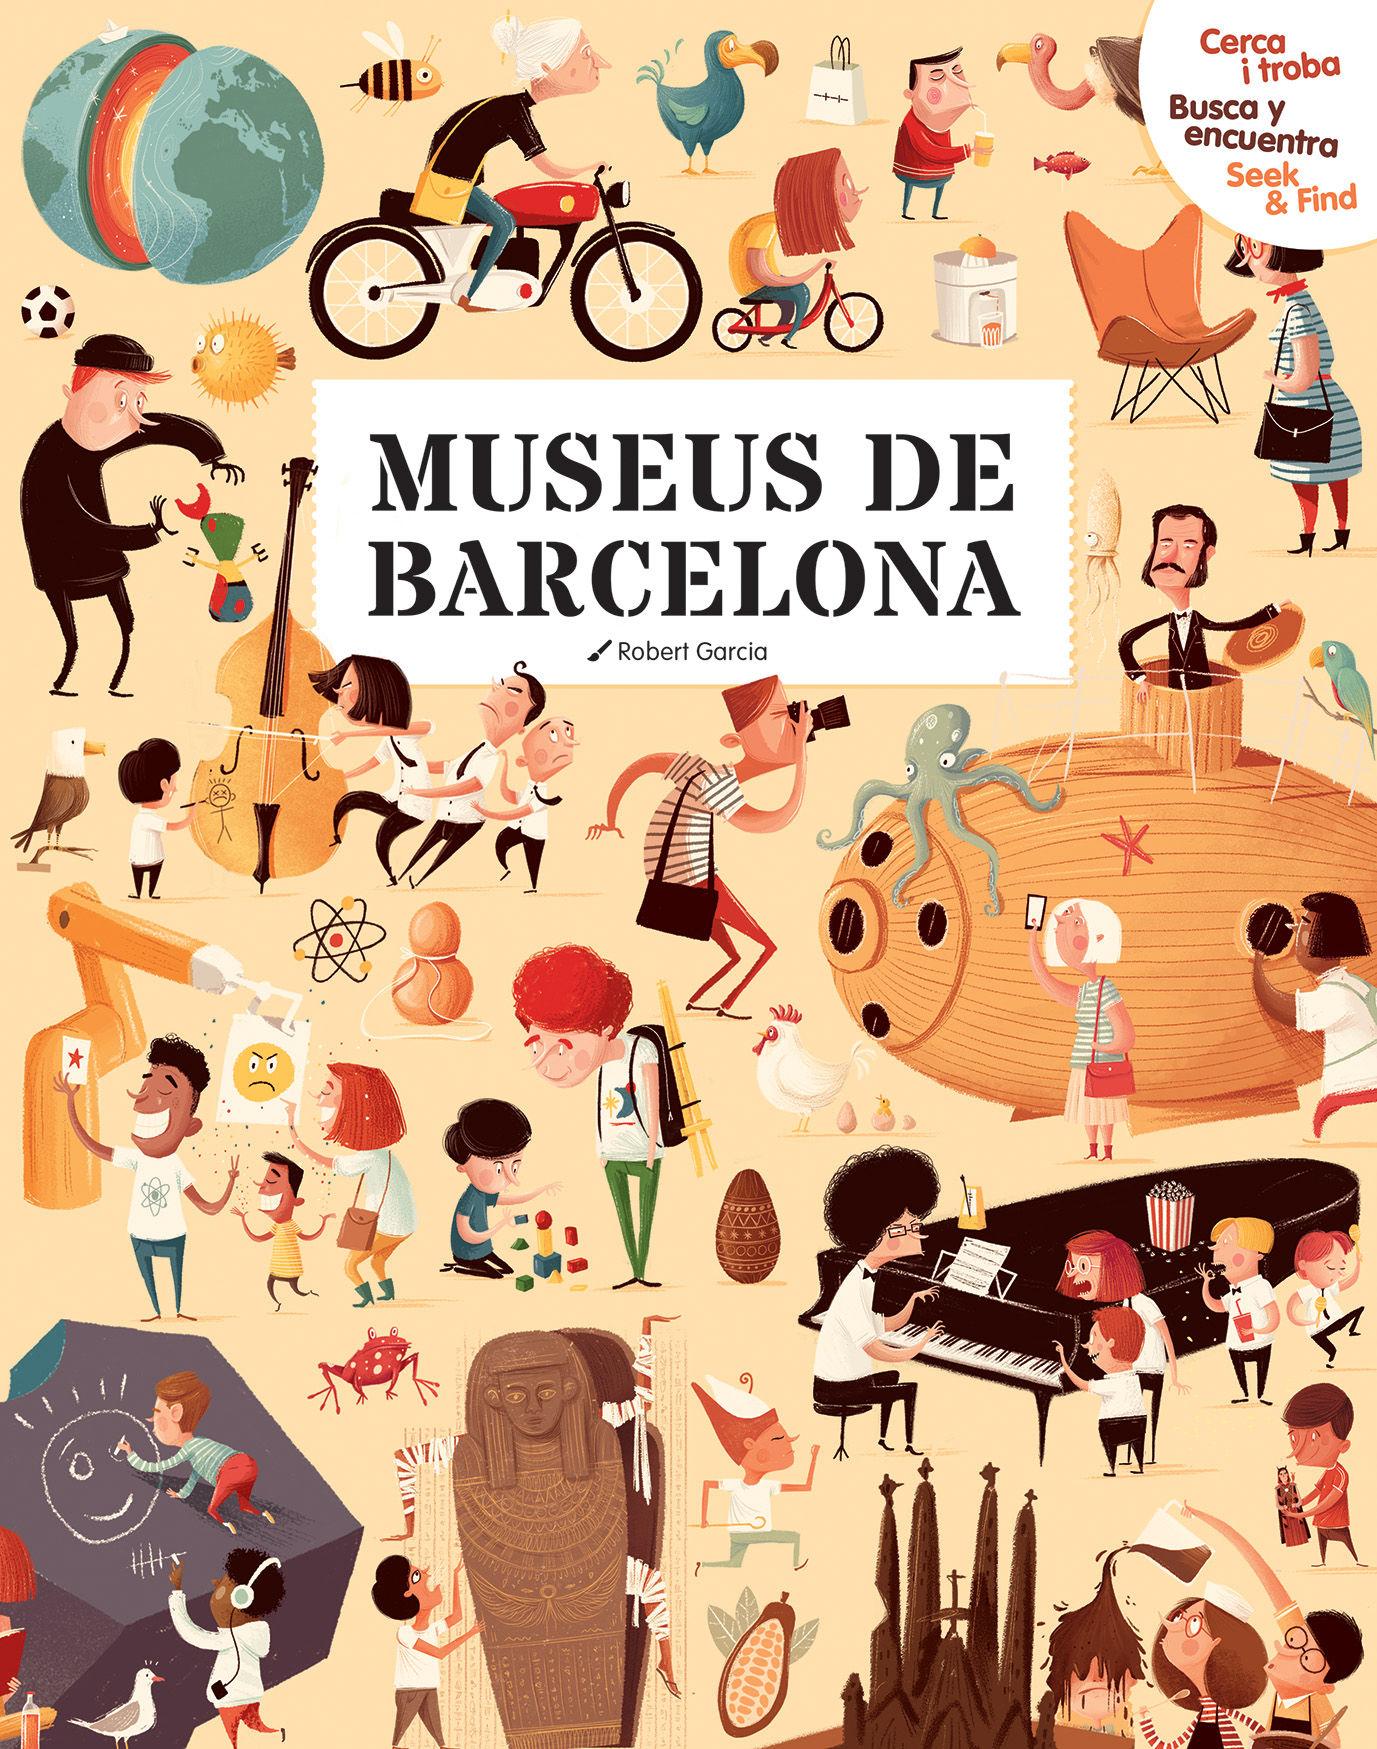 MUSEUS DE BARCELONA